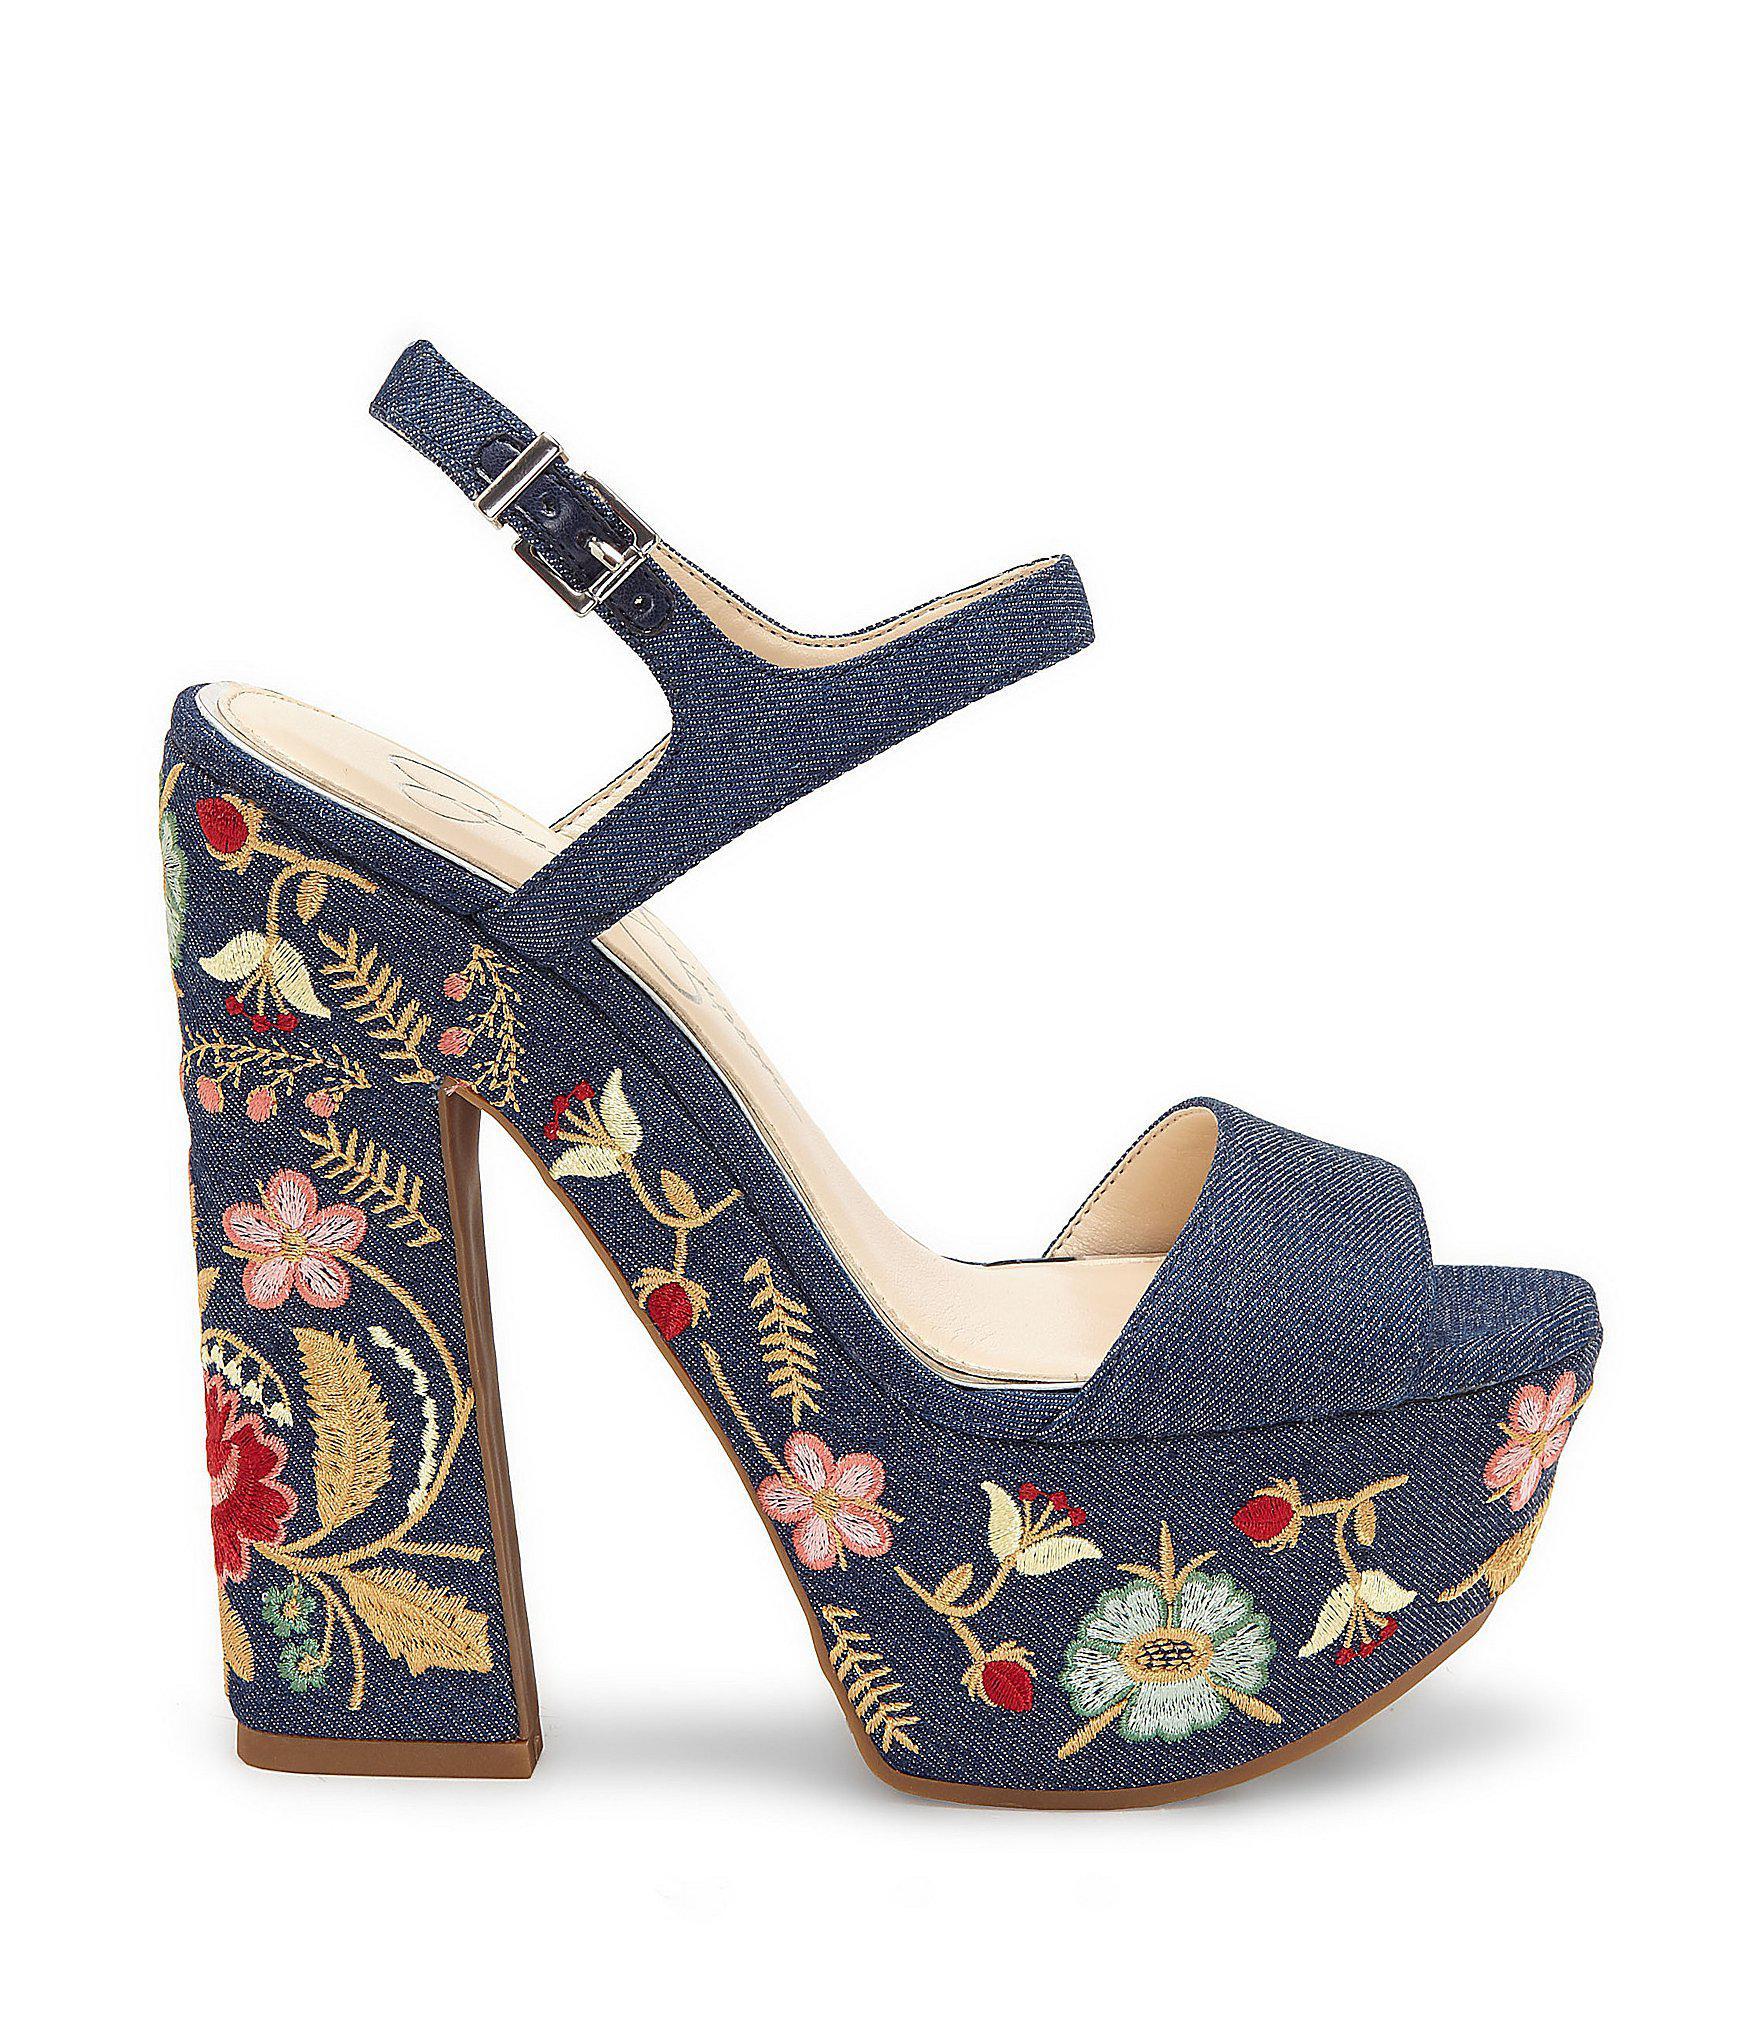 ba0360309b1 Lyst - Jessica Simpson Divella2 Denim Floral Platform Sandal in Blue